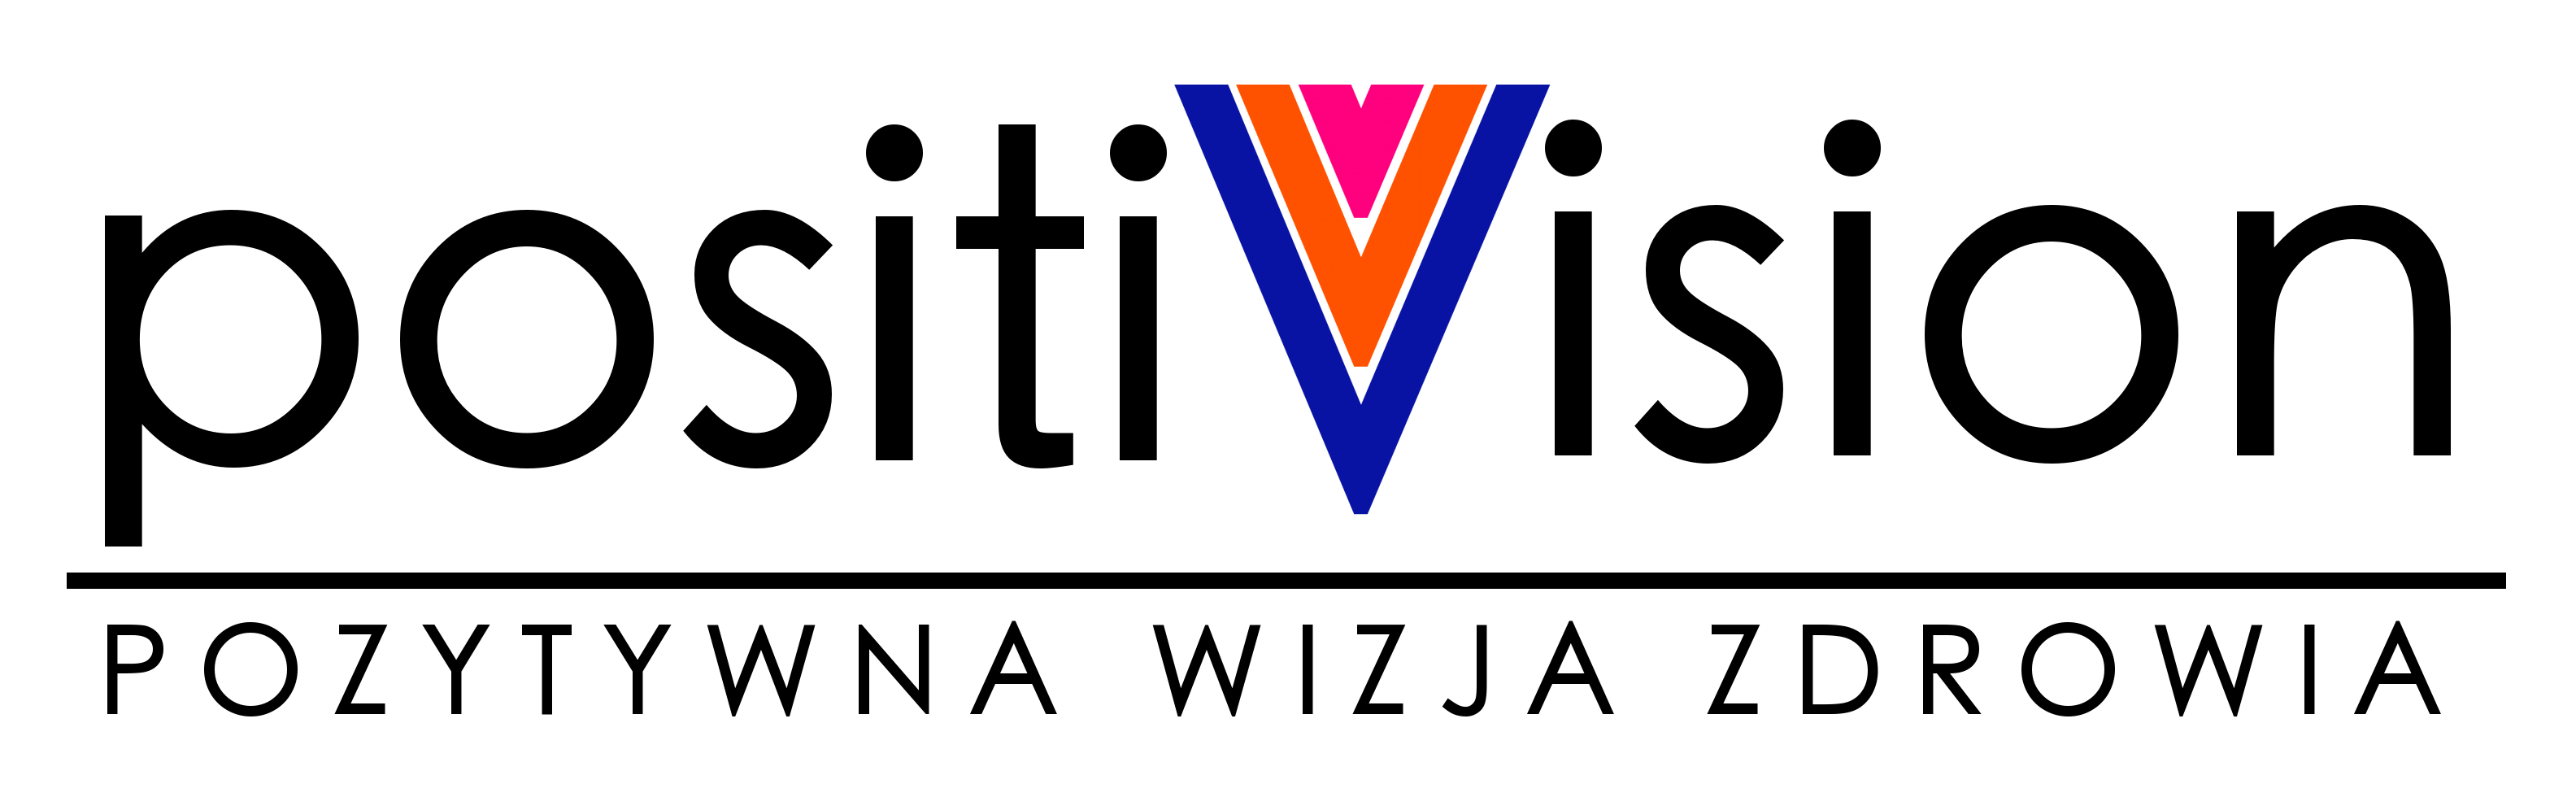 04 logo positiVision